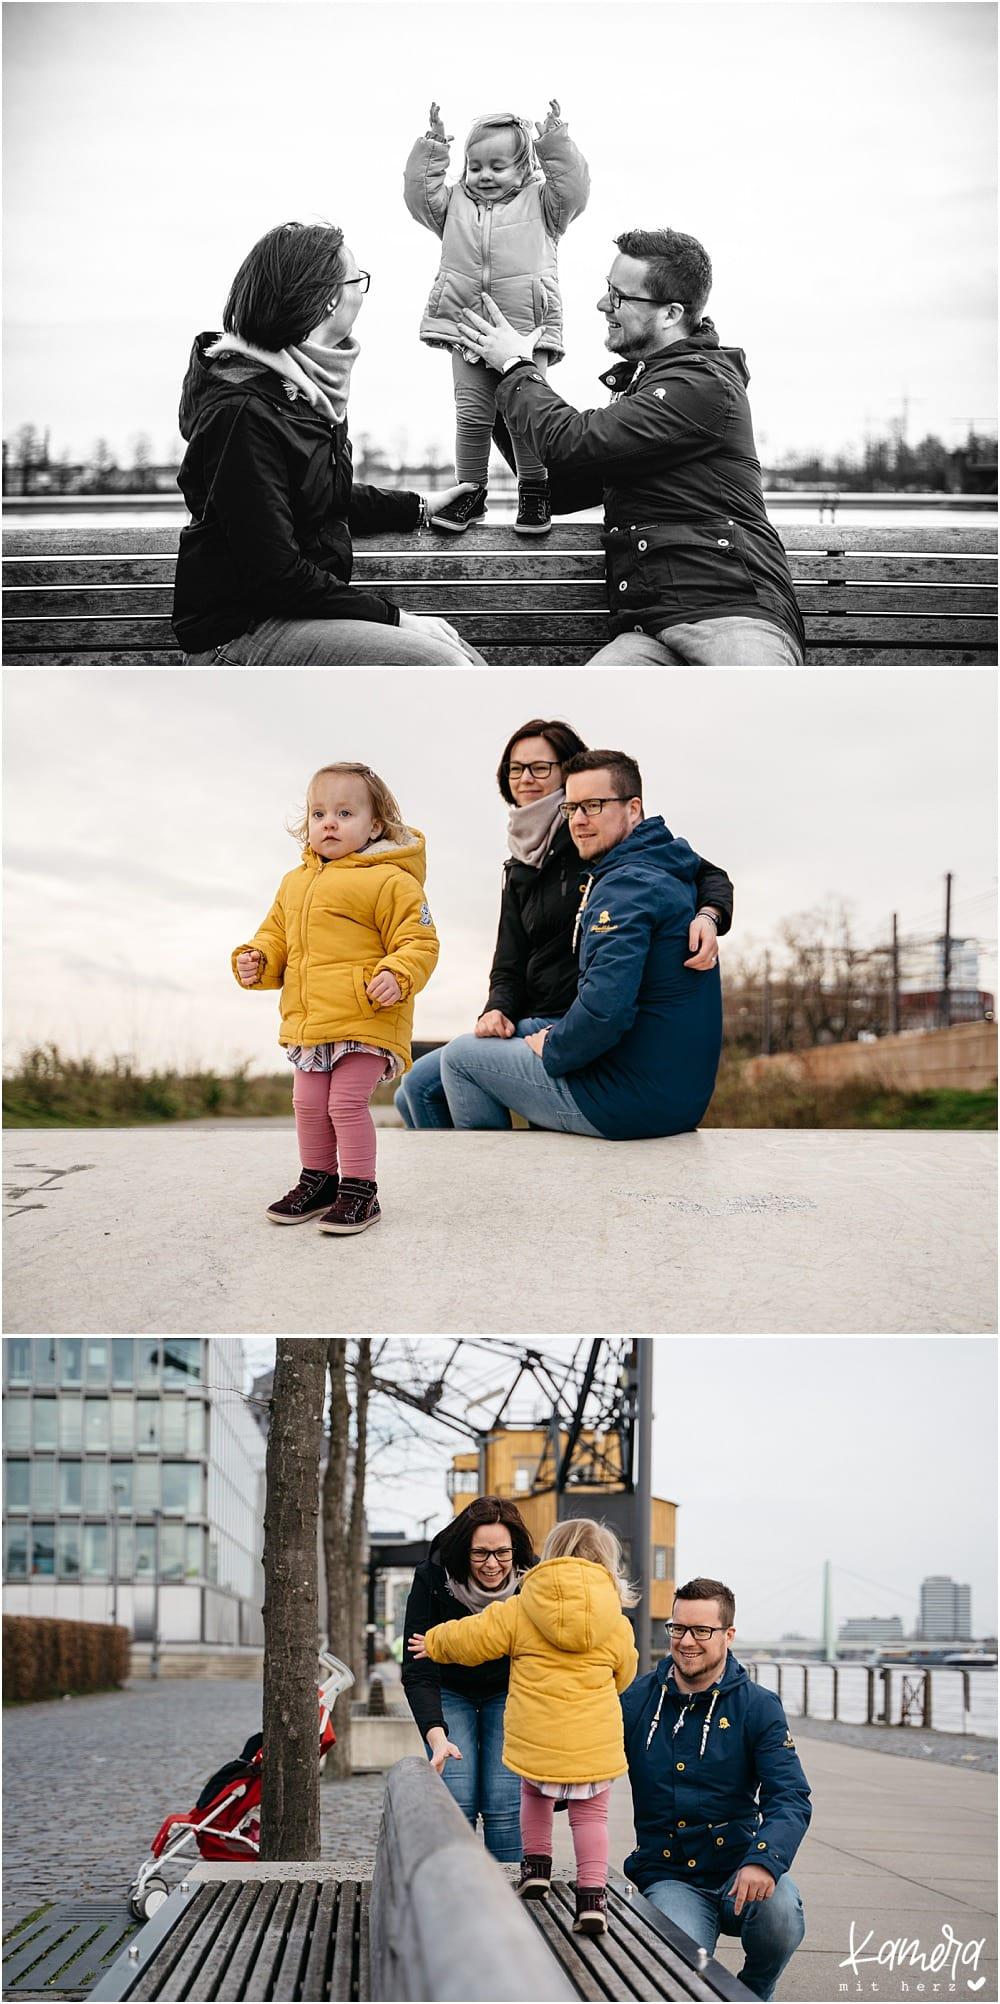 Familienshooting in Köln